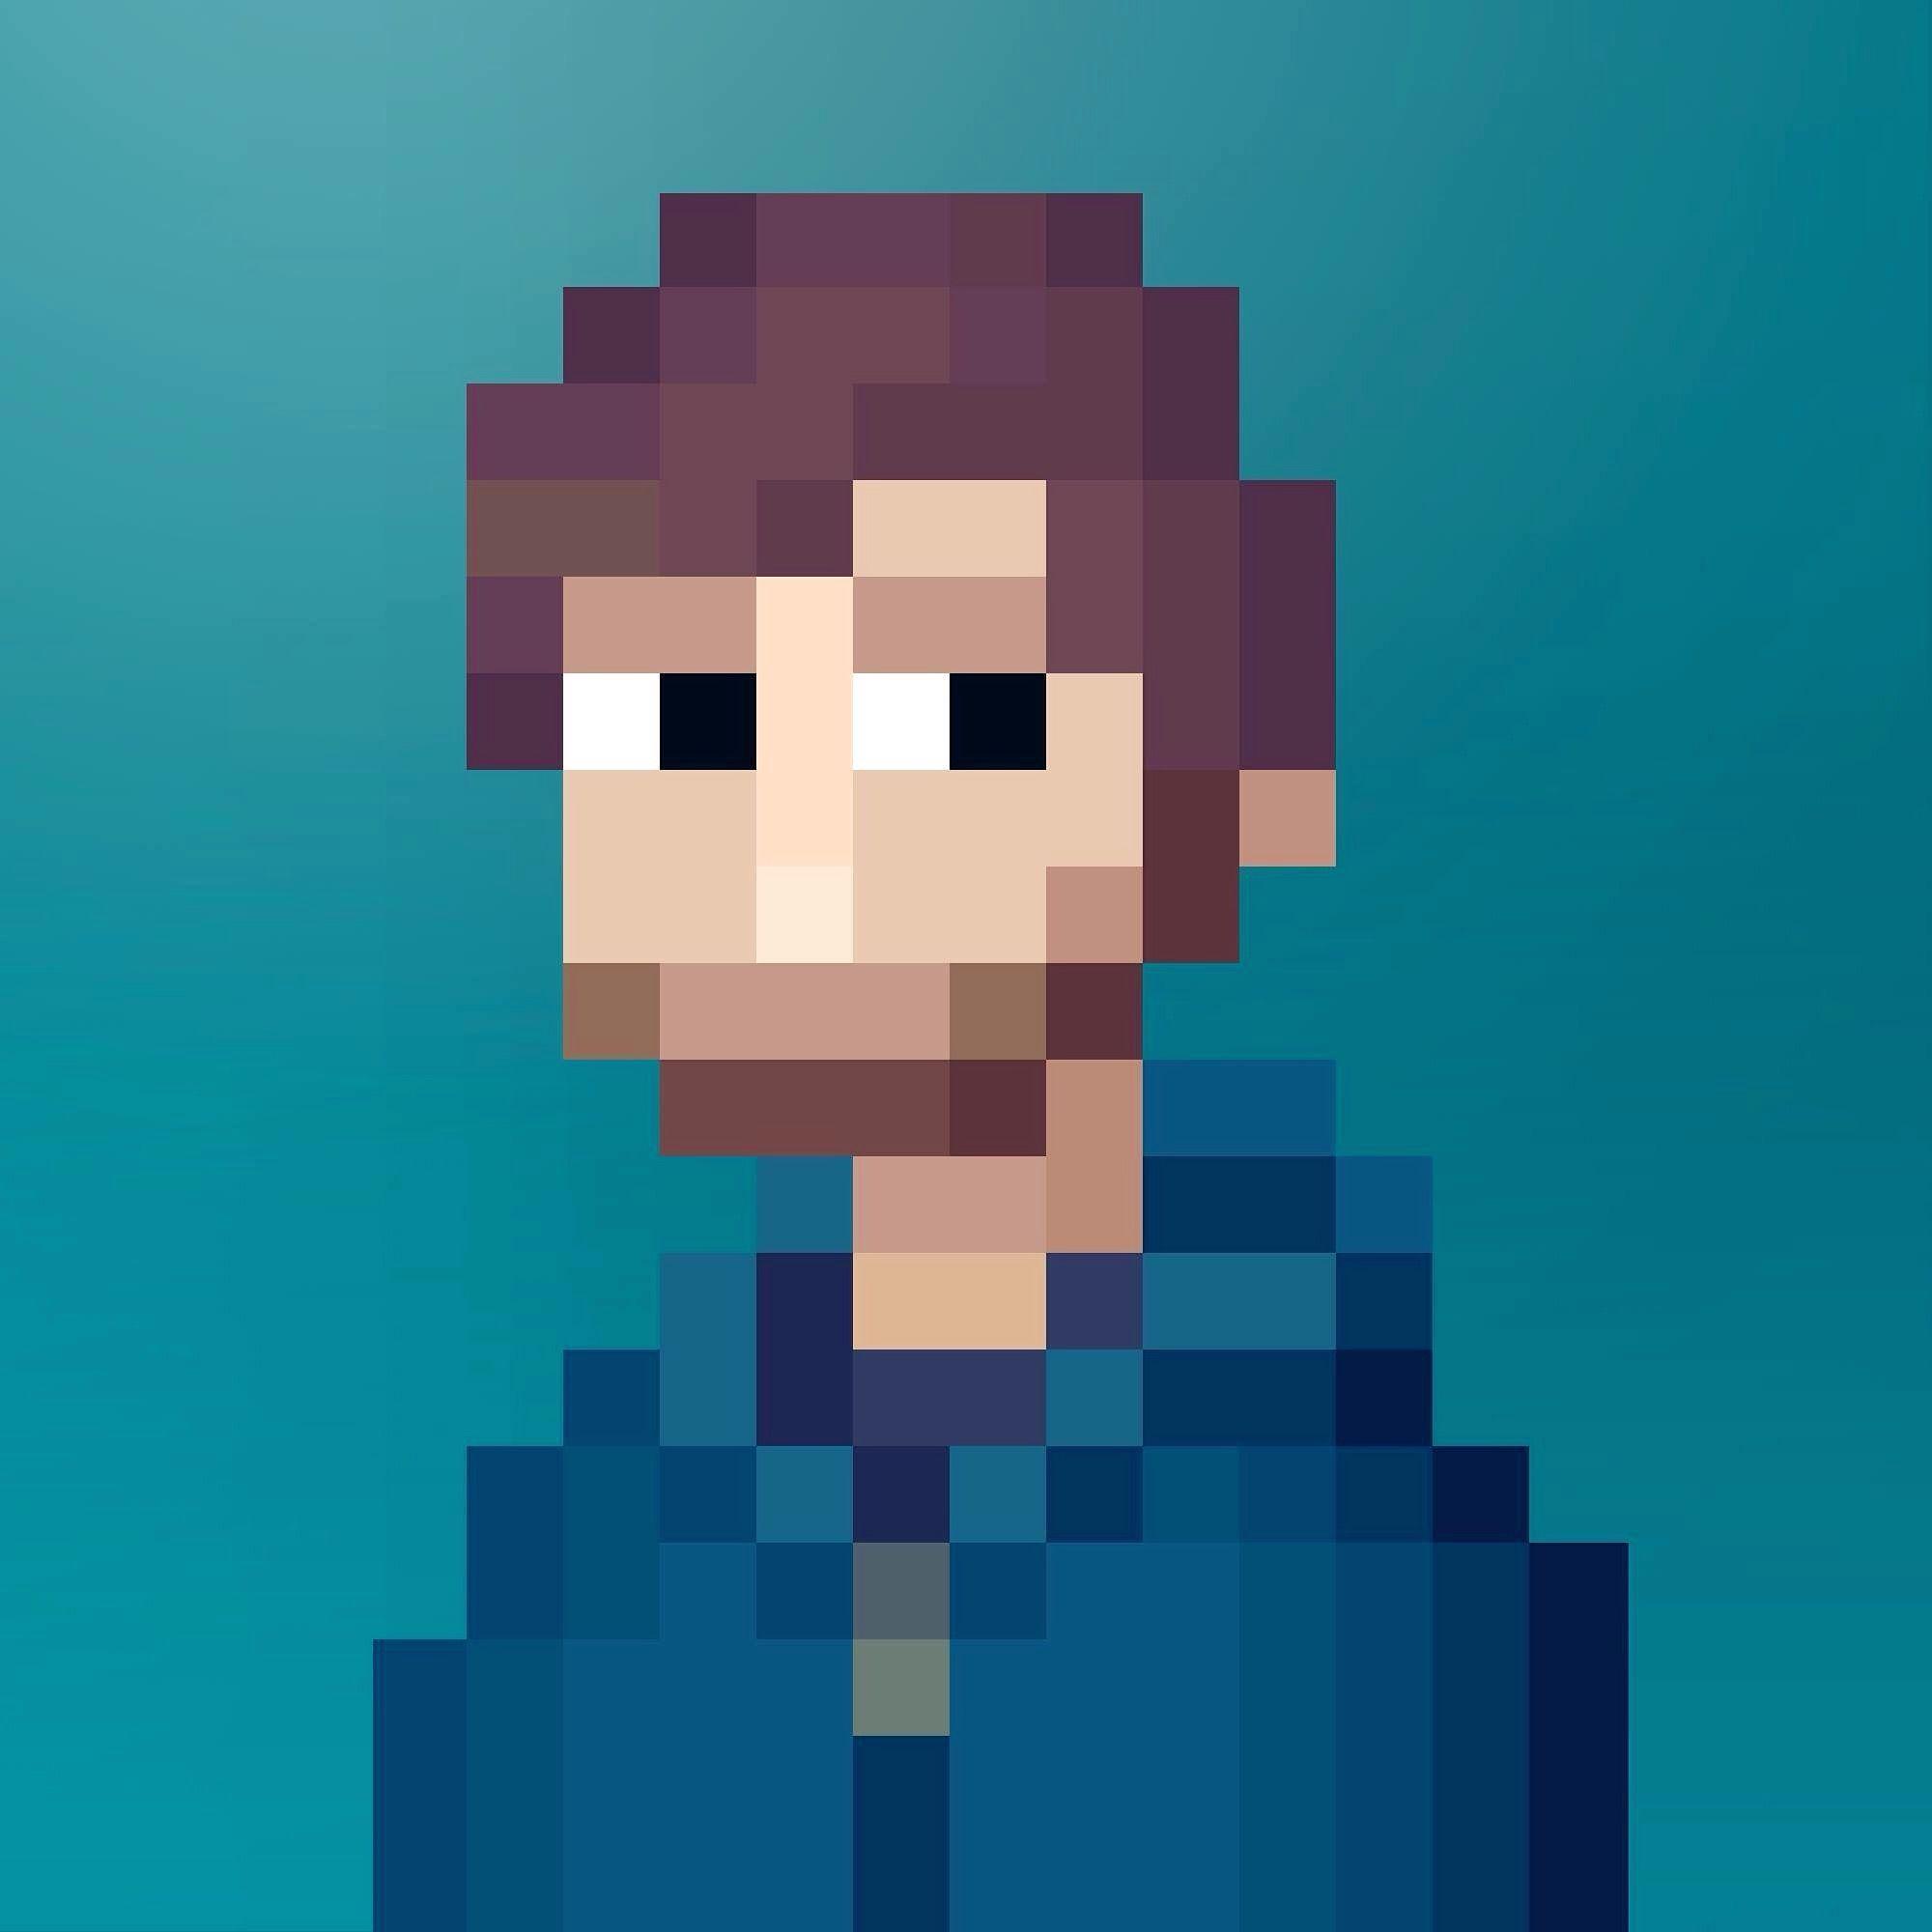 Self Pixel Portrait - have yours made on Fiverr! https://uk.fiverr.com/s2/1748f27d0c